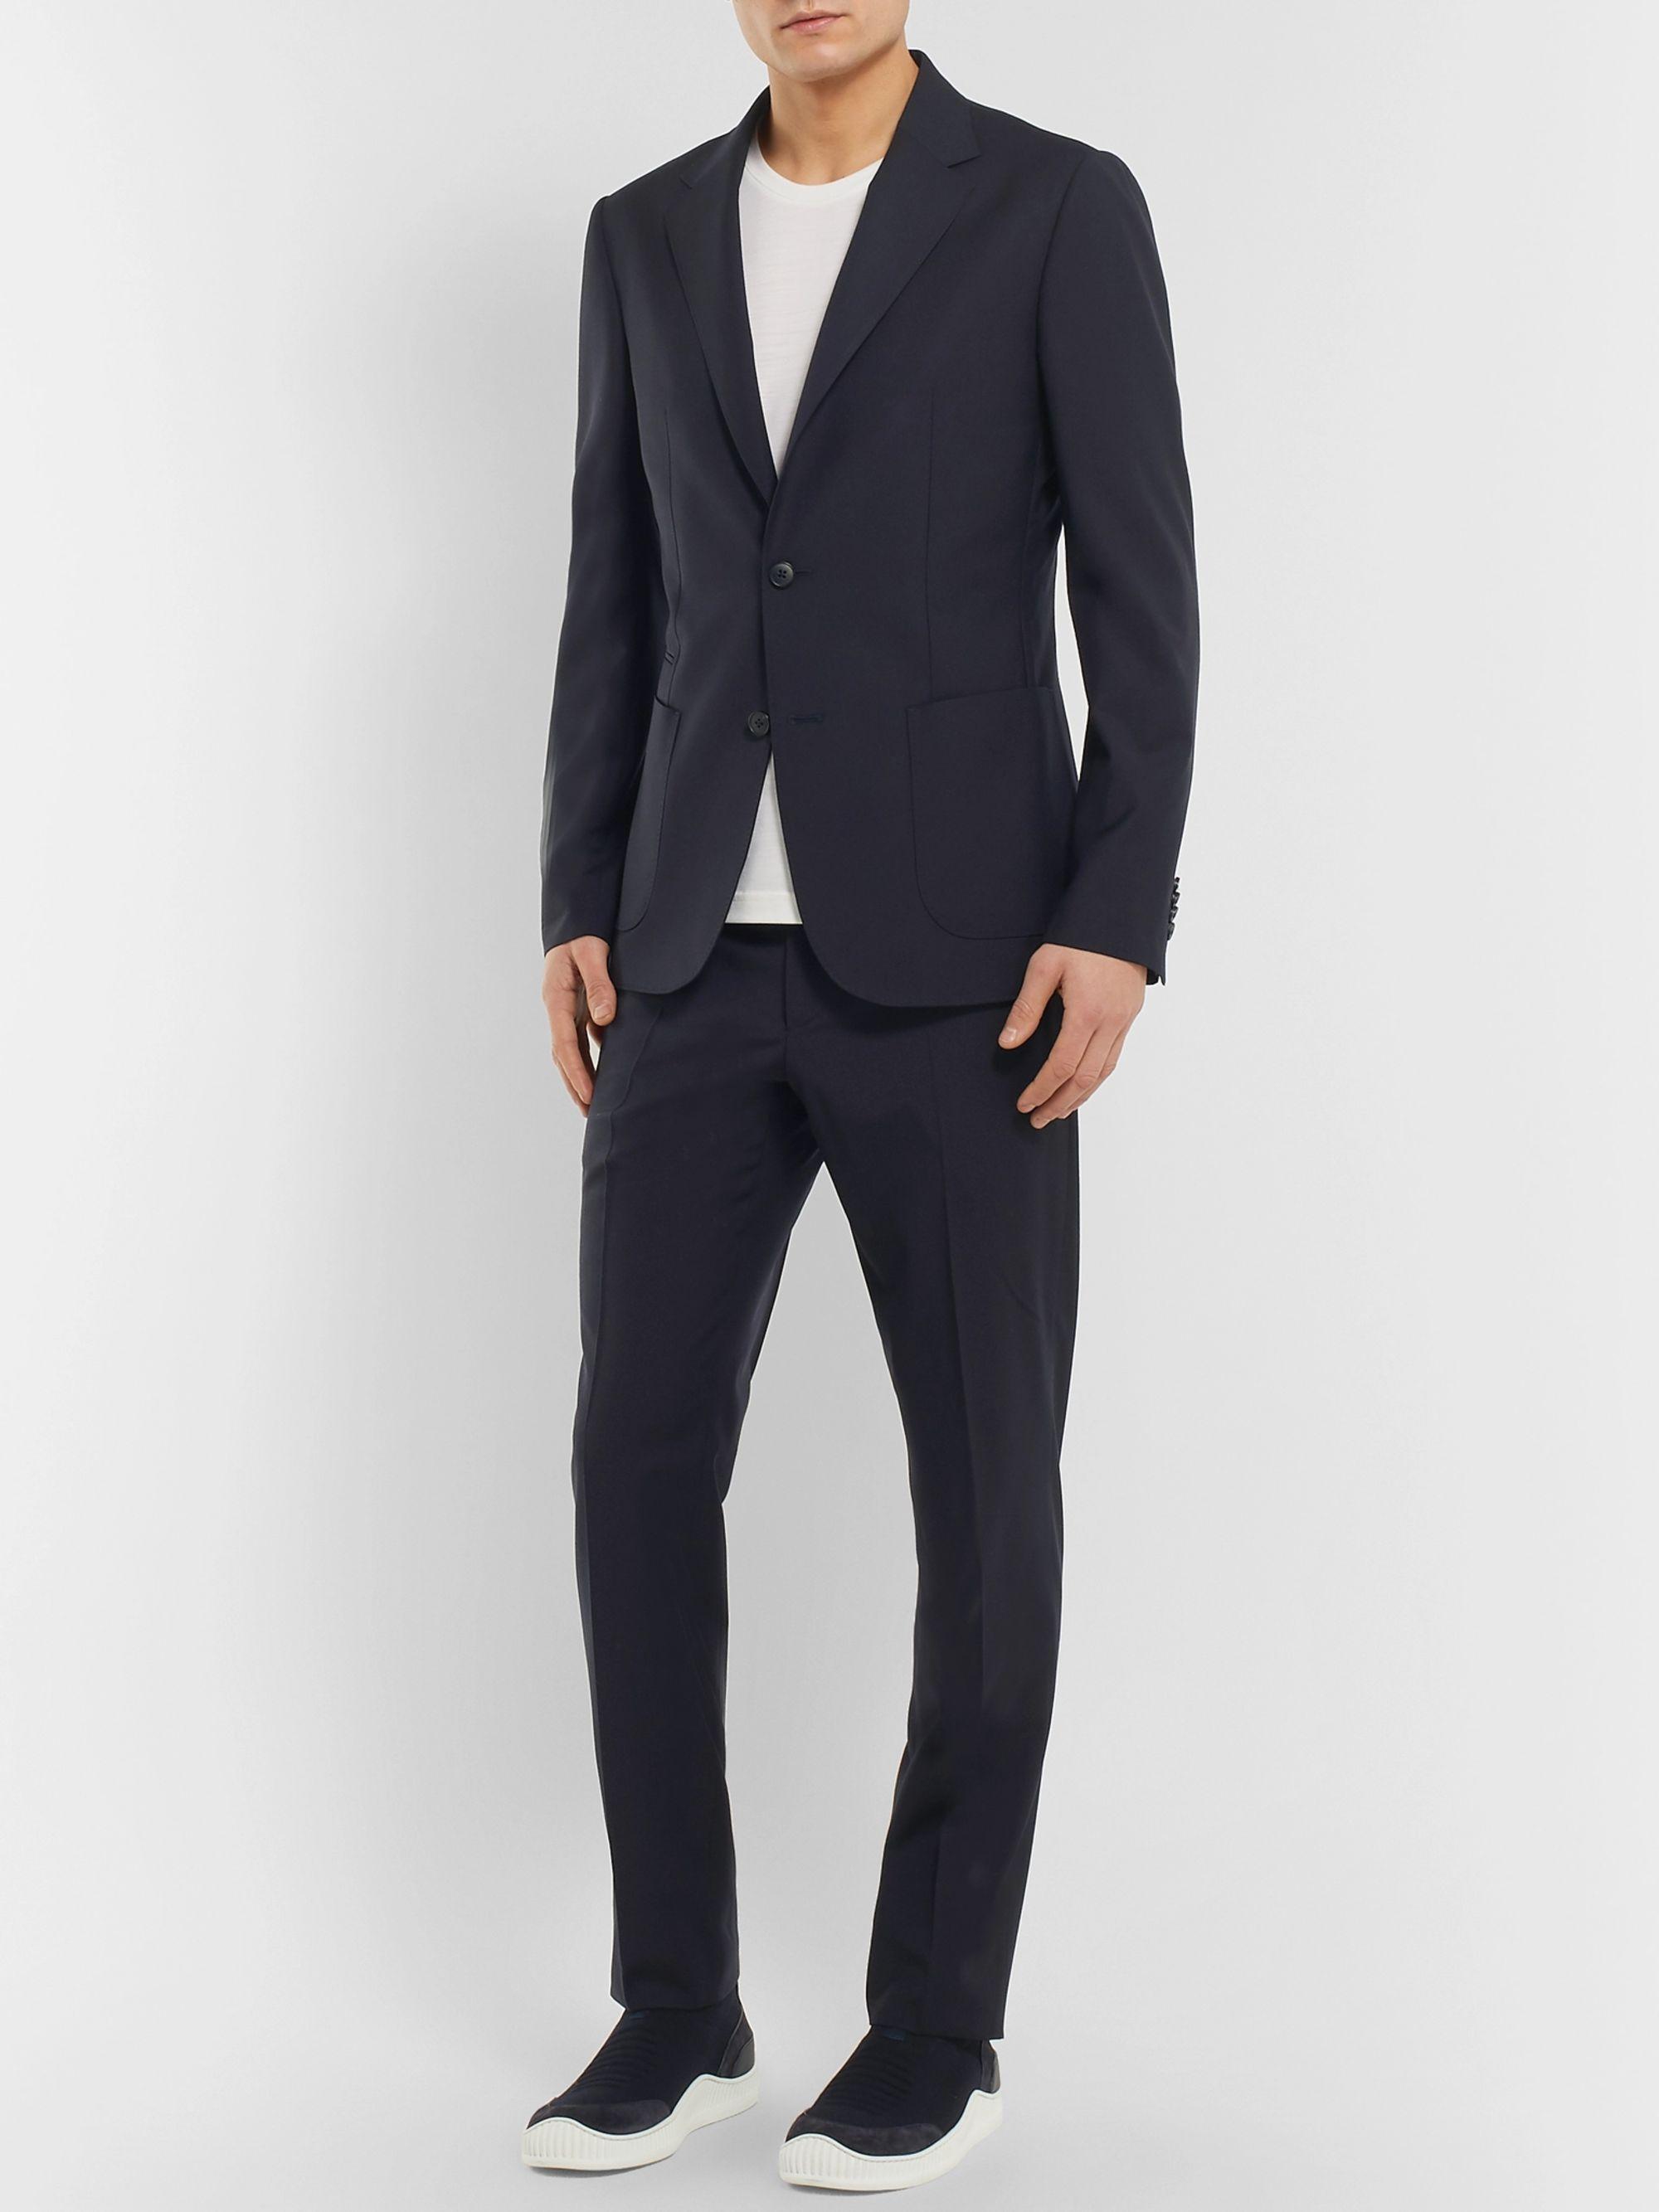 63073900 Midnight-Blue Slim-Fit Wash & Go TECHMERINO Wool Suit